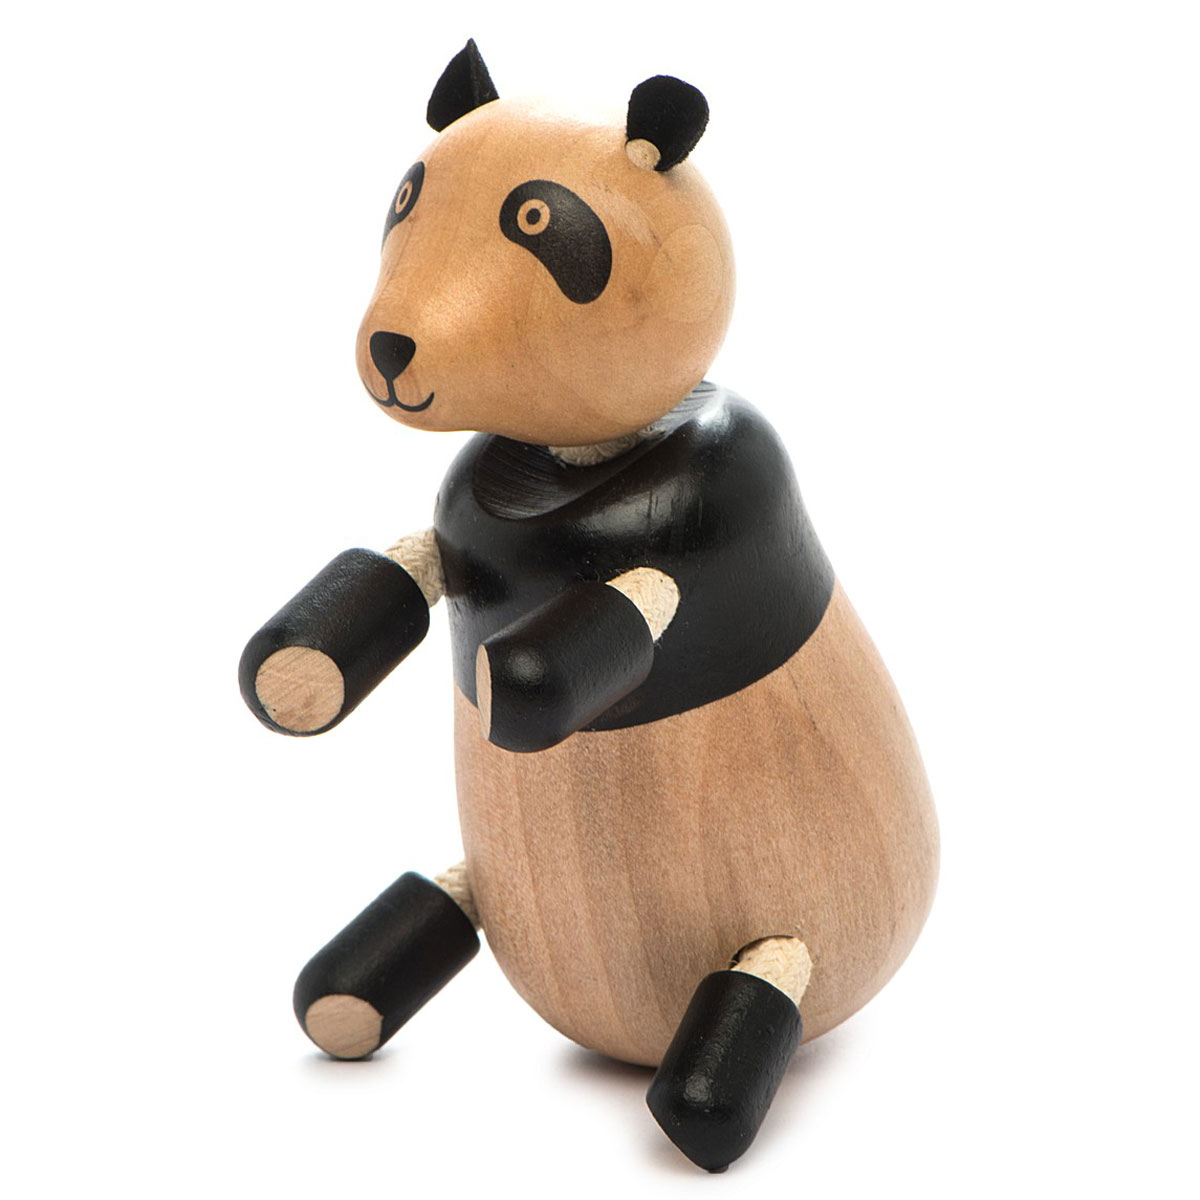 AnaMalz Фигурка деревянная Панда фигурки игрушки anamalz anamalz бурый мишка